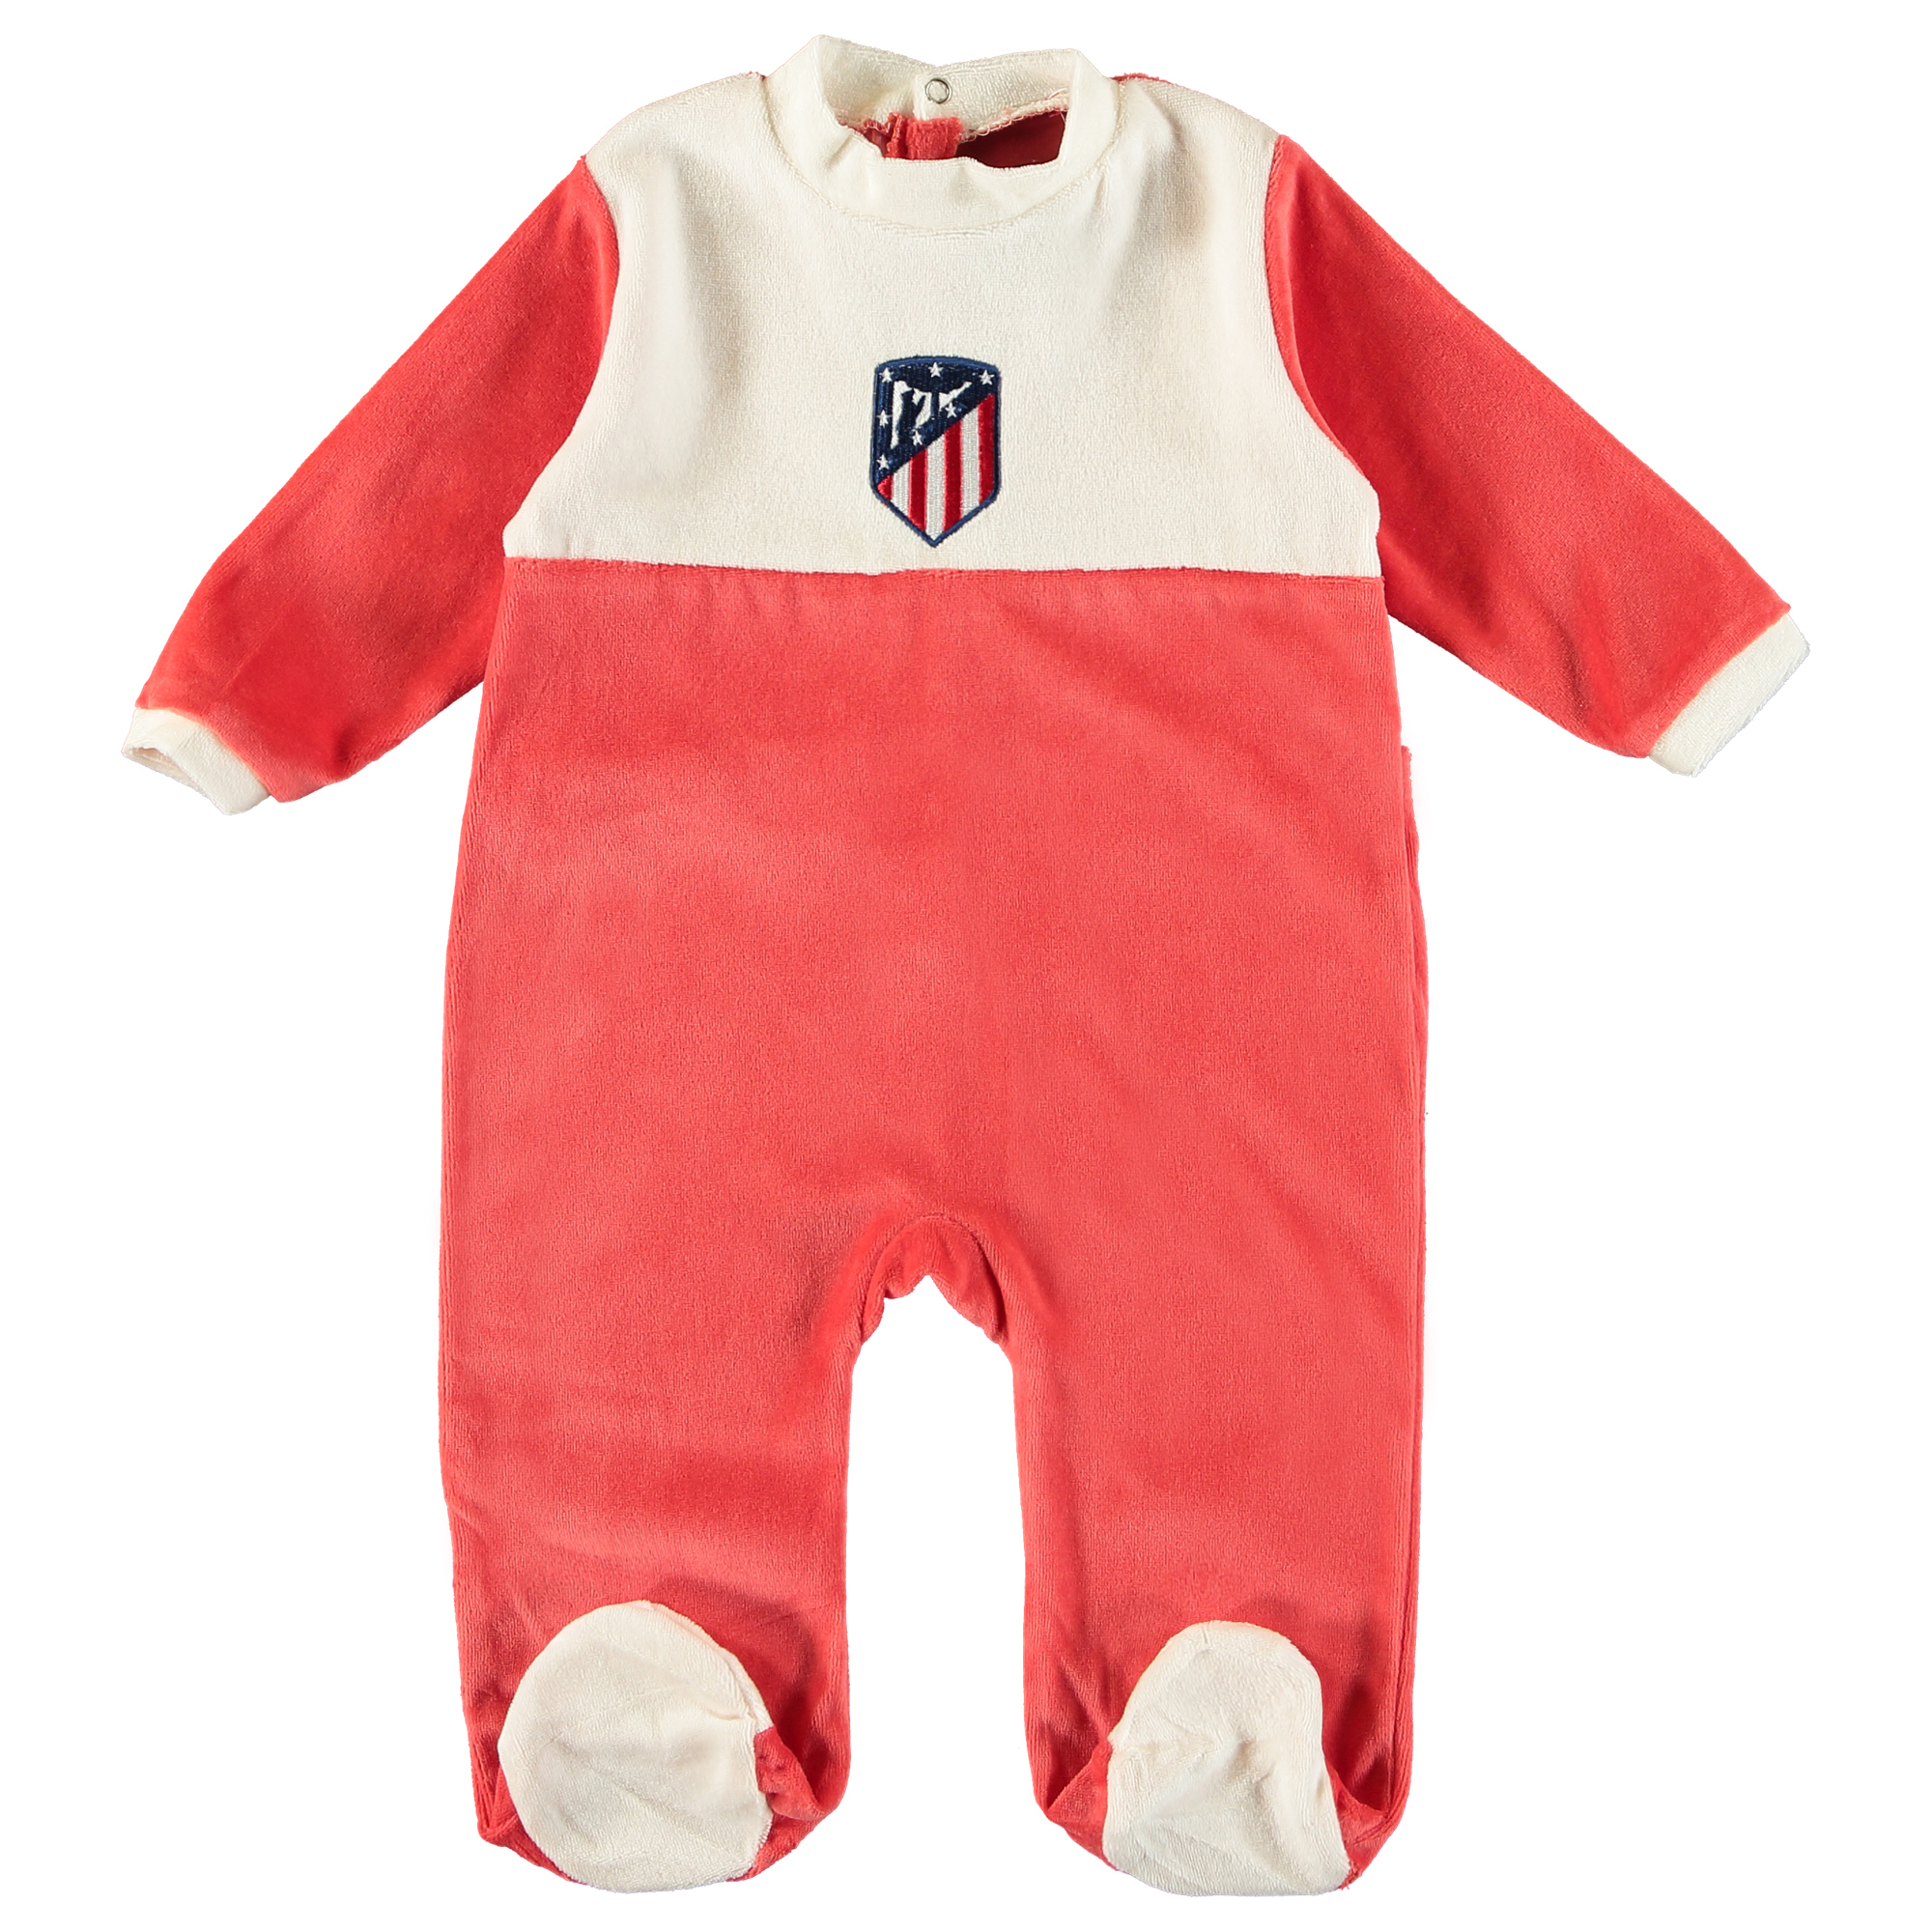 Pyjama de l'Atlético de Madrid - Rouge/Blanc - Bébé